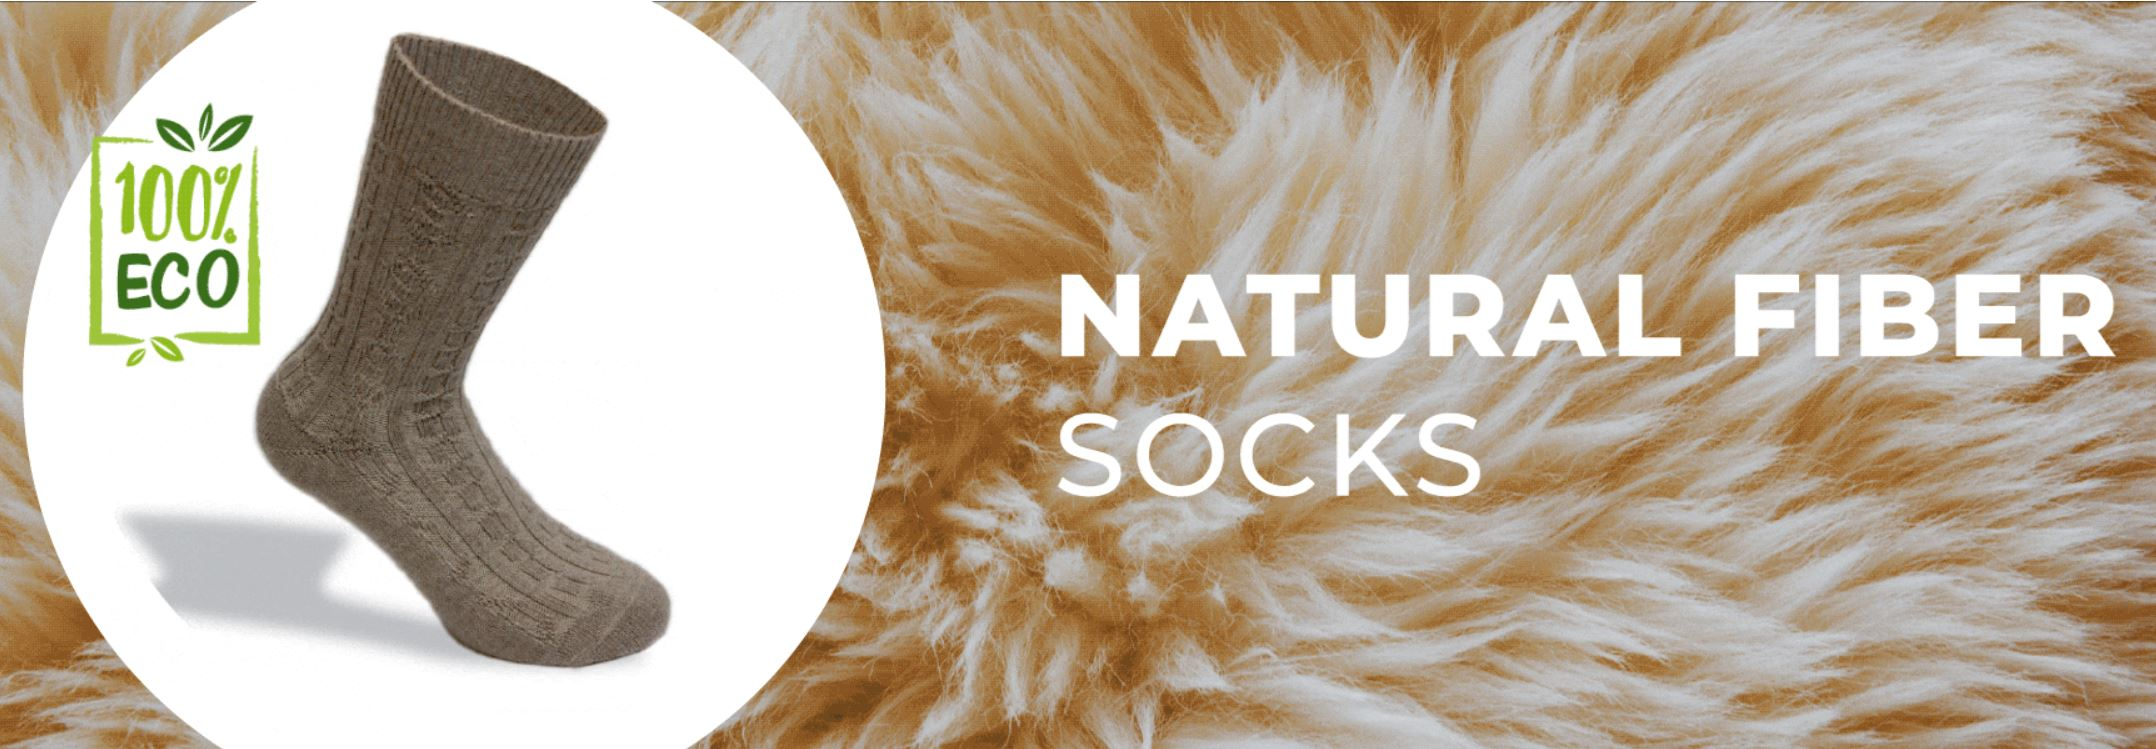 natural fiber socks